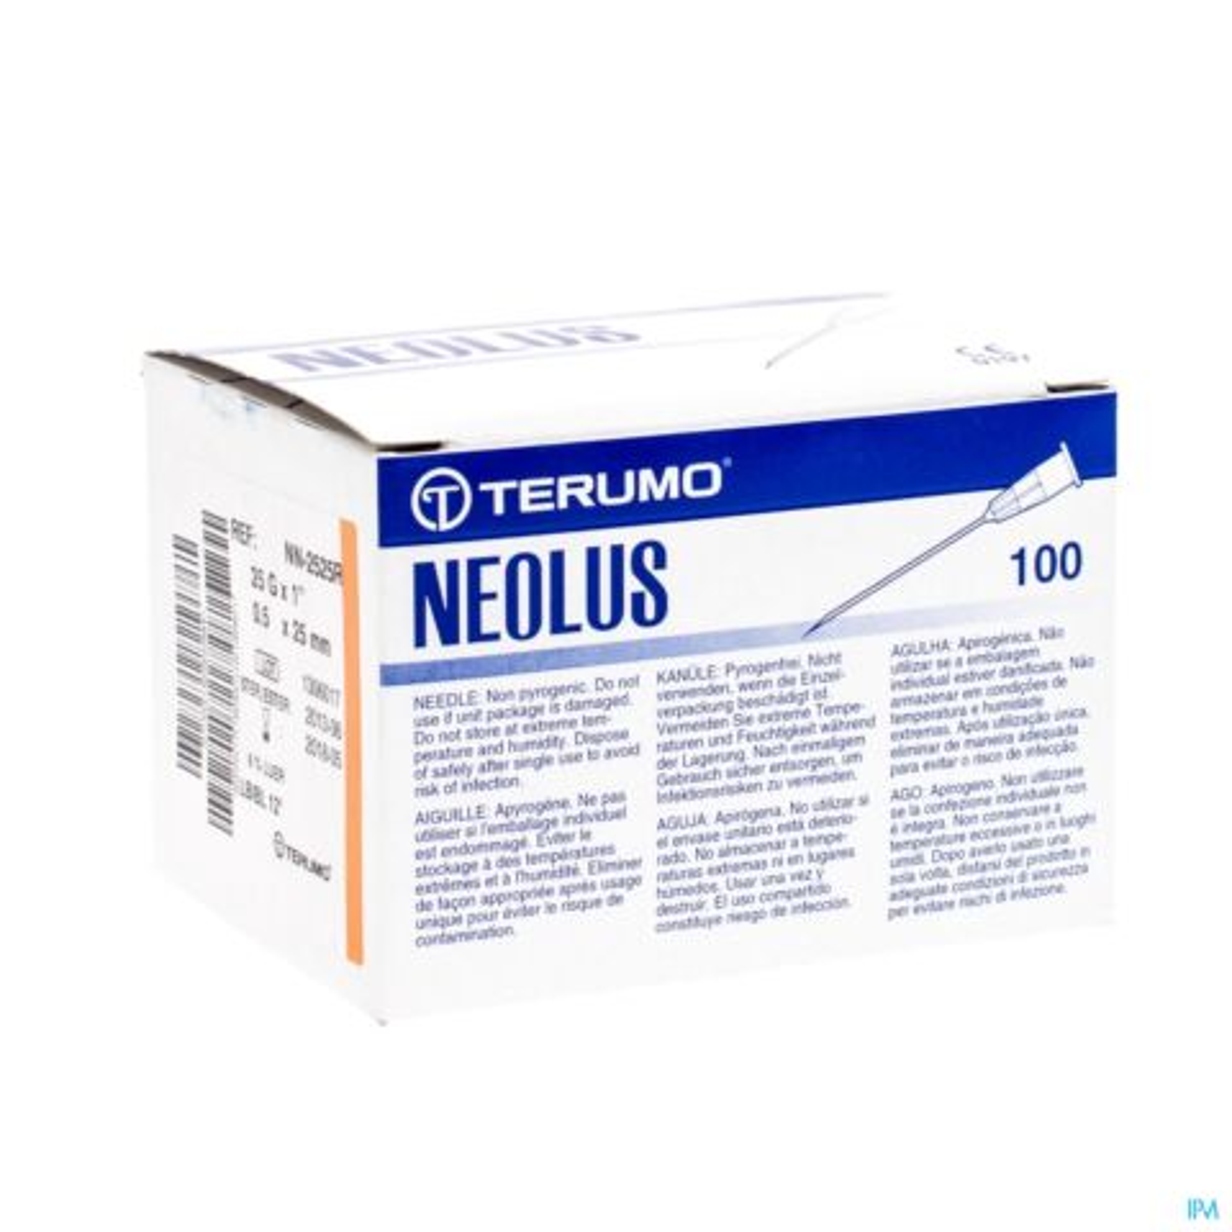 TERUMO NAALD NEOLUS 25G 1 RB ORANJE 100